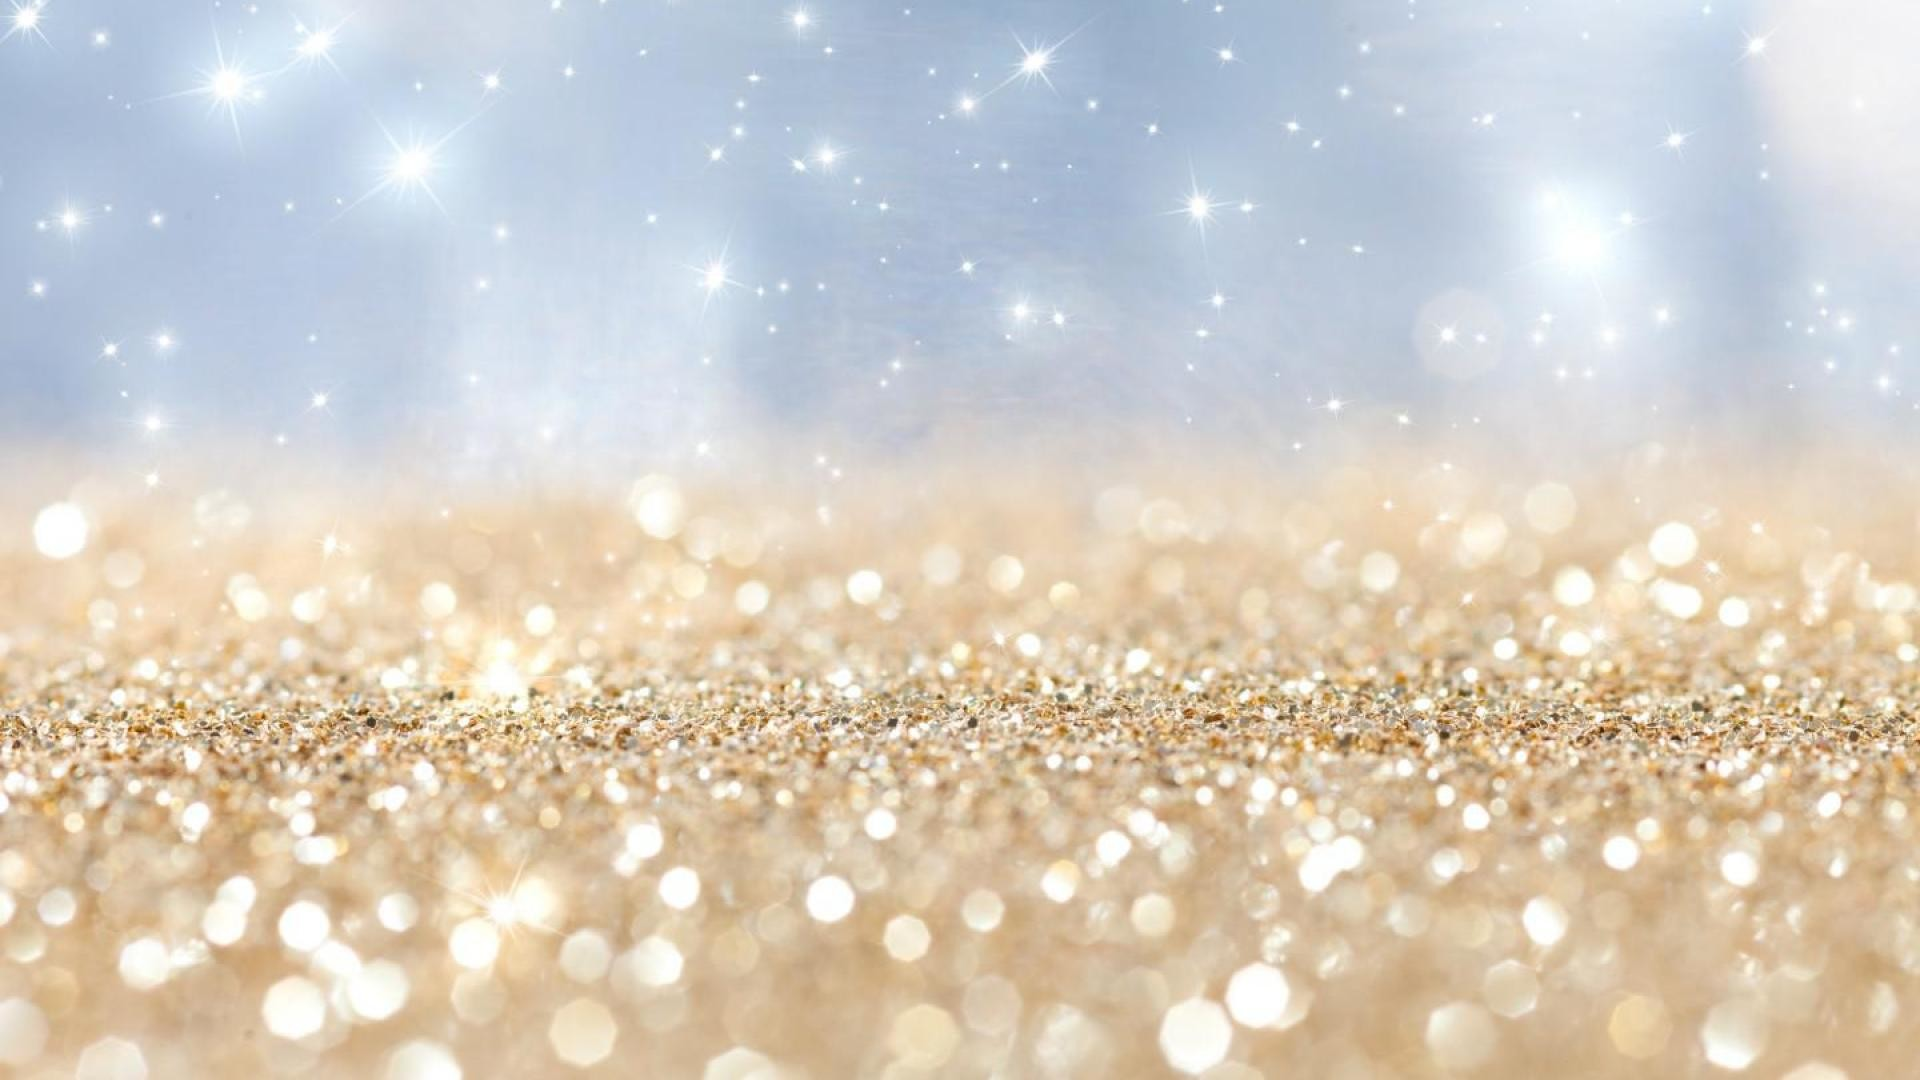 Glitter Wallpaper Backgrounds